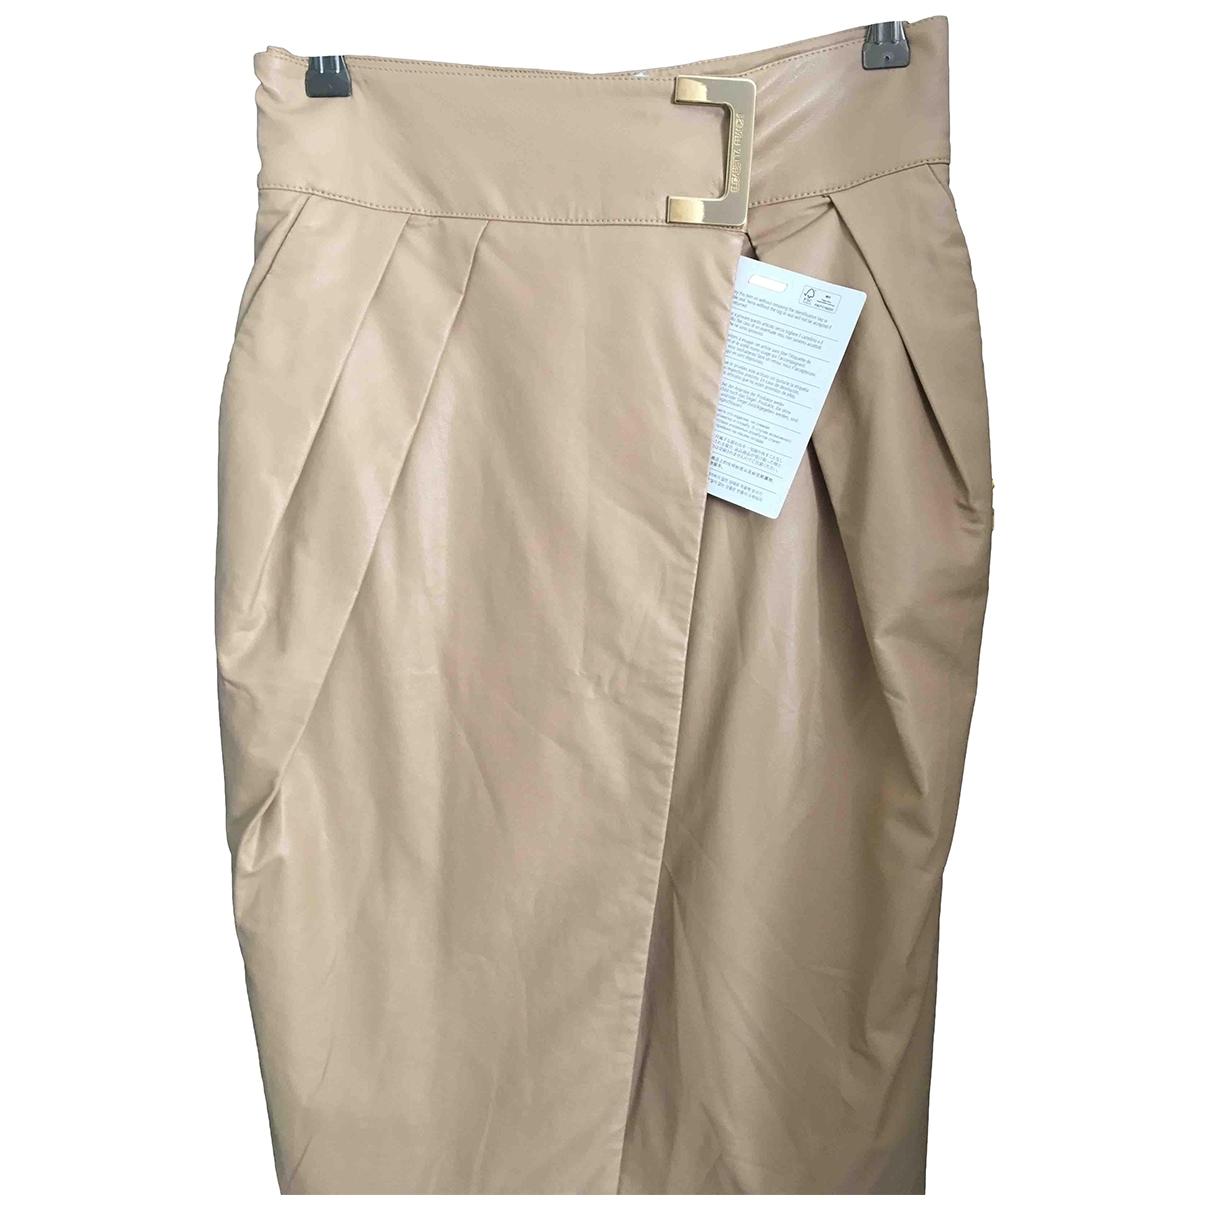 Elisabetta Franchi \N Beige Leather skirt for Women 42 IT